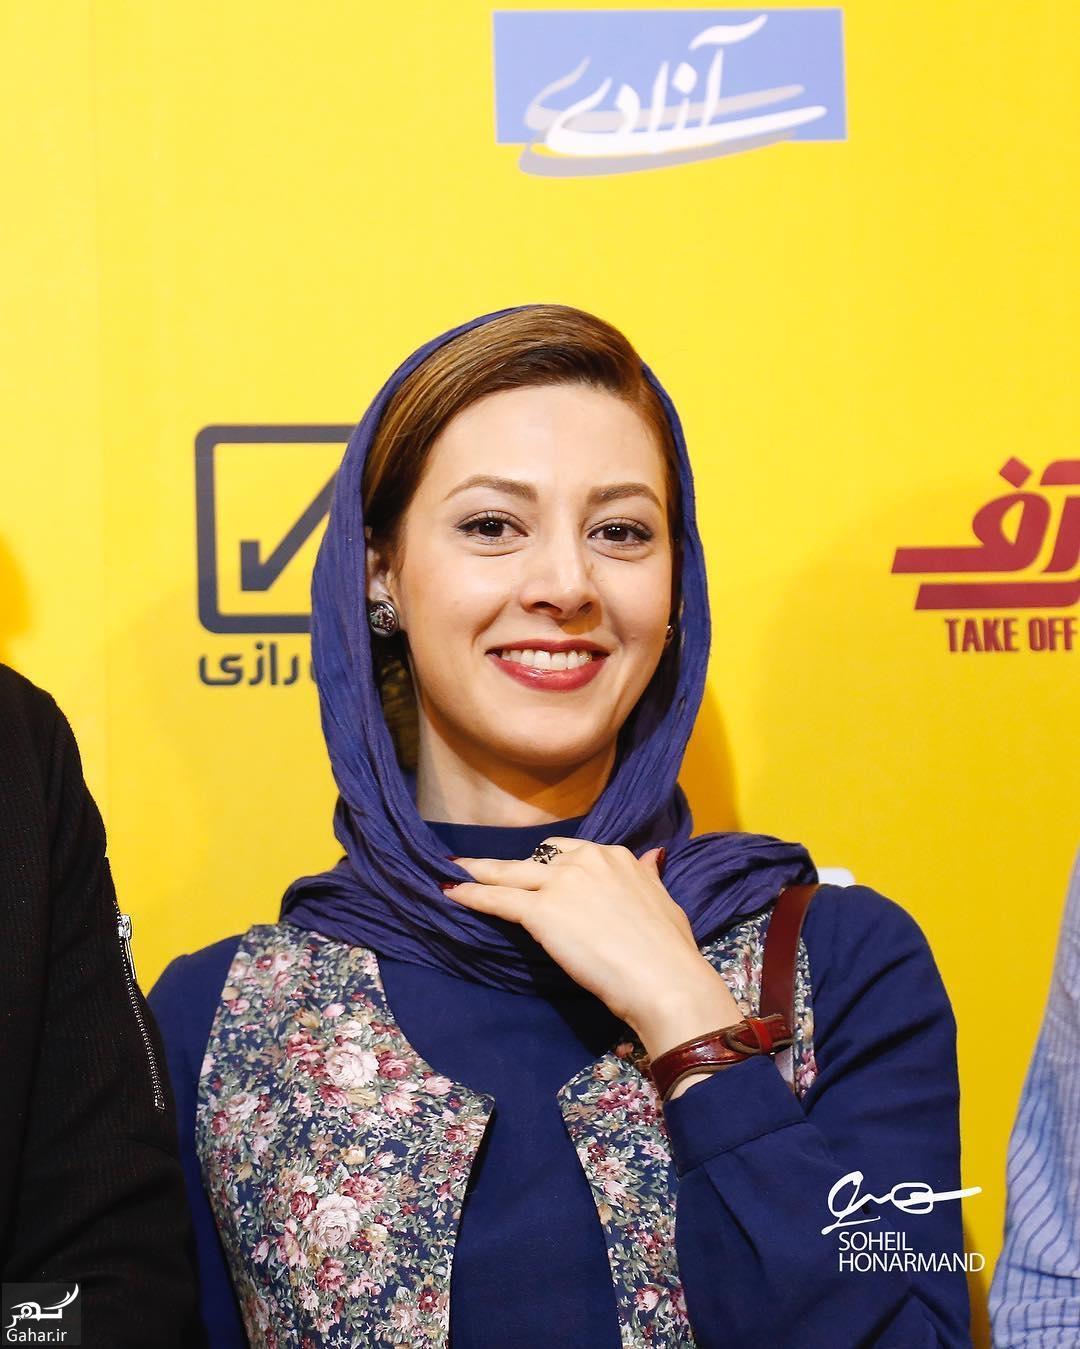 773384 Gahar ir بازیگران در اکران مردمی فیلم «تیک آف» + عکس